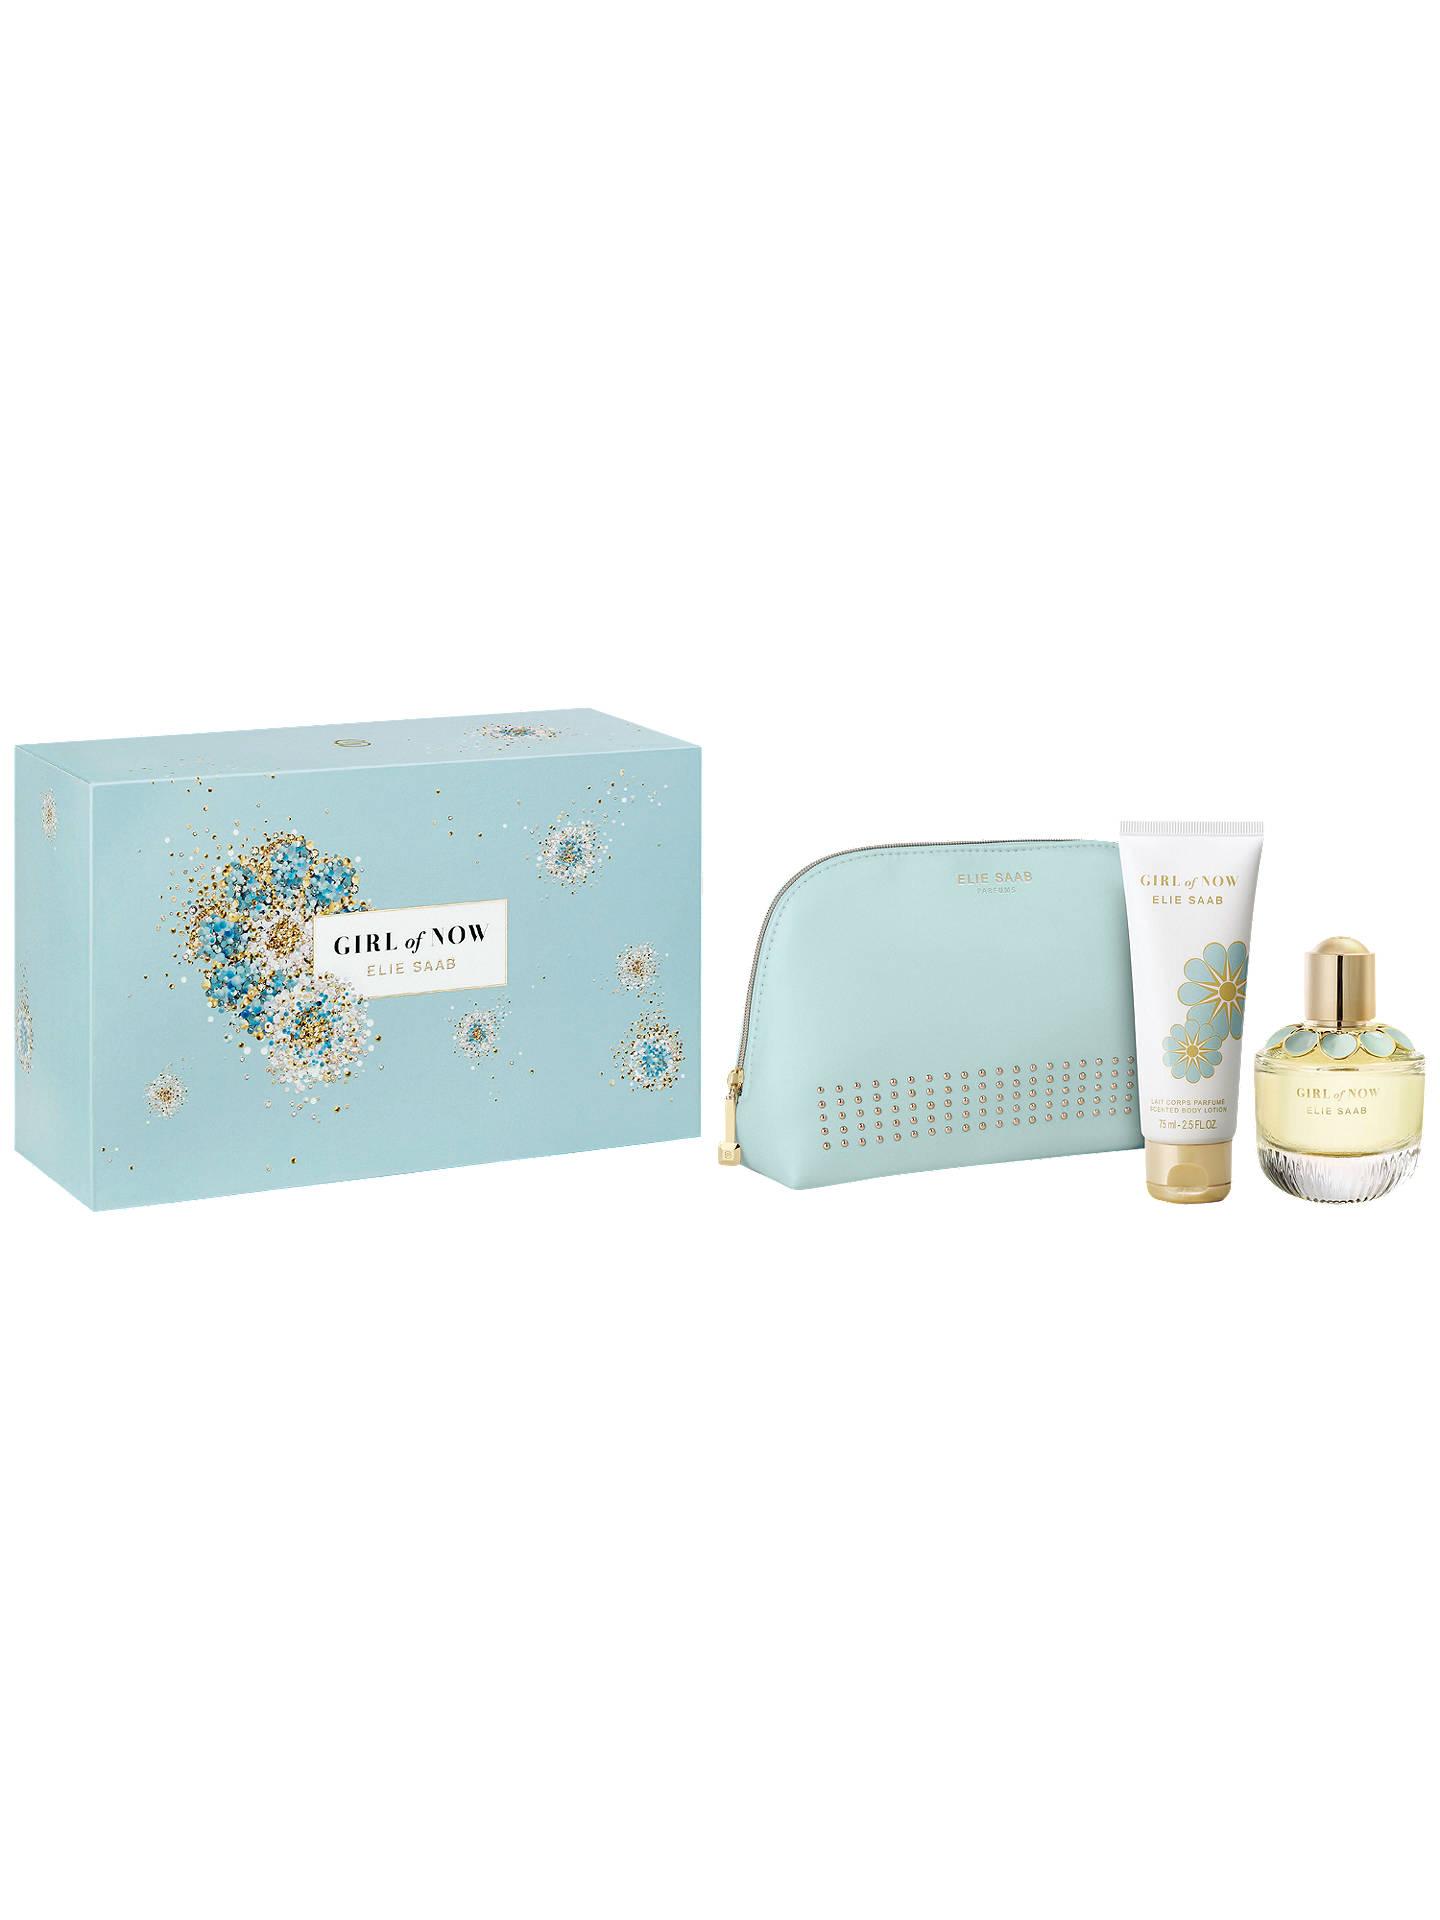 bc482998f83ac Buy Elie Saab Girl of Now 50ml Eau de Parfum Fragrance Gift Set Online at  johnlewis